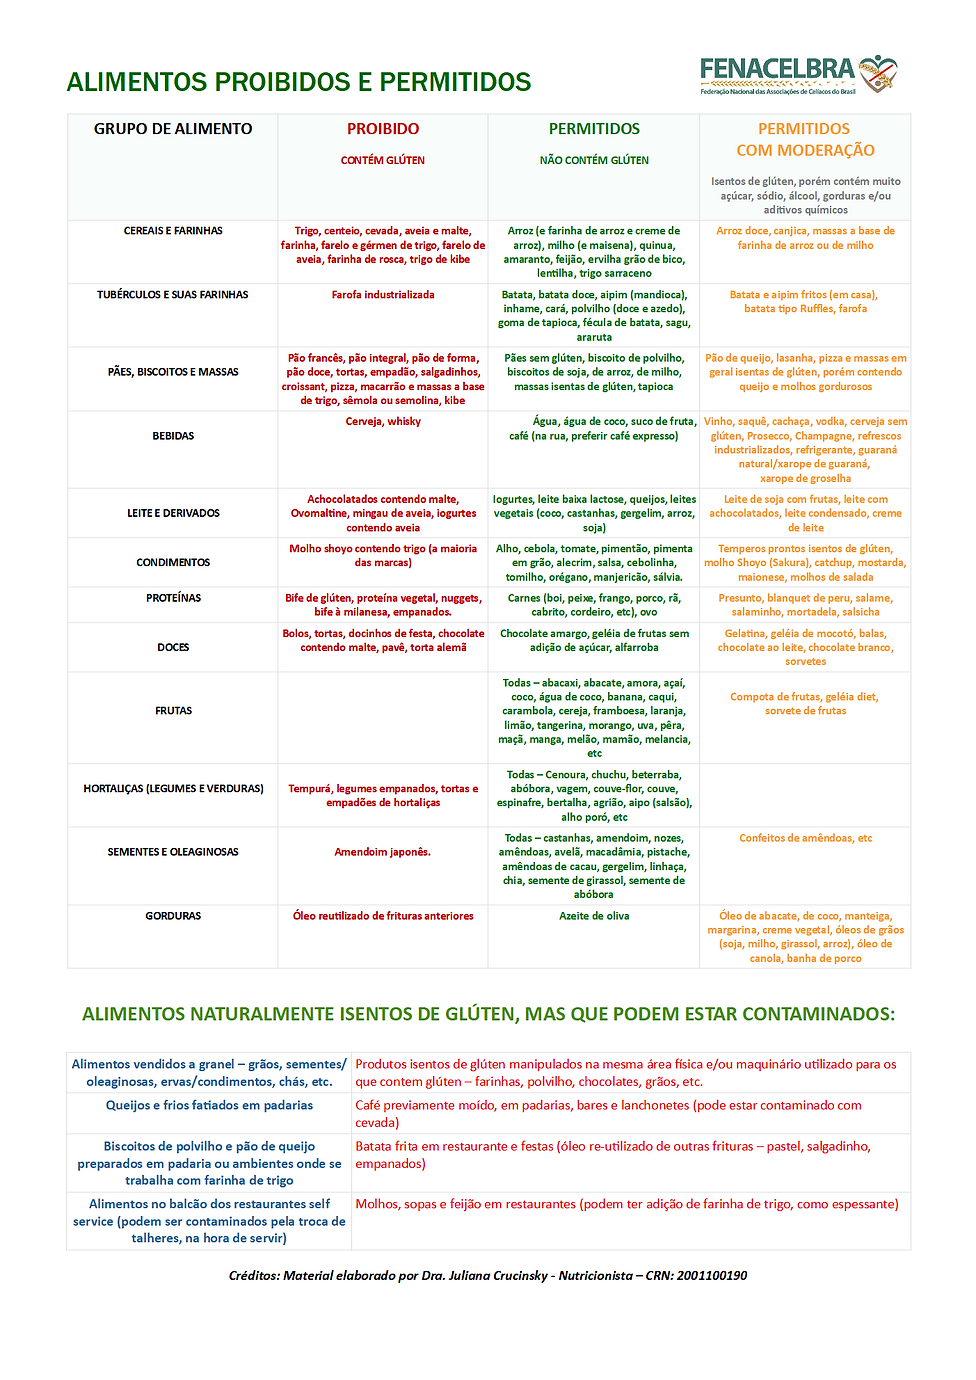 Tabela de Alimentos FENACELBRA.png